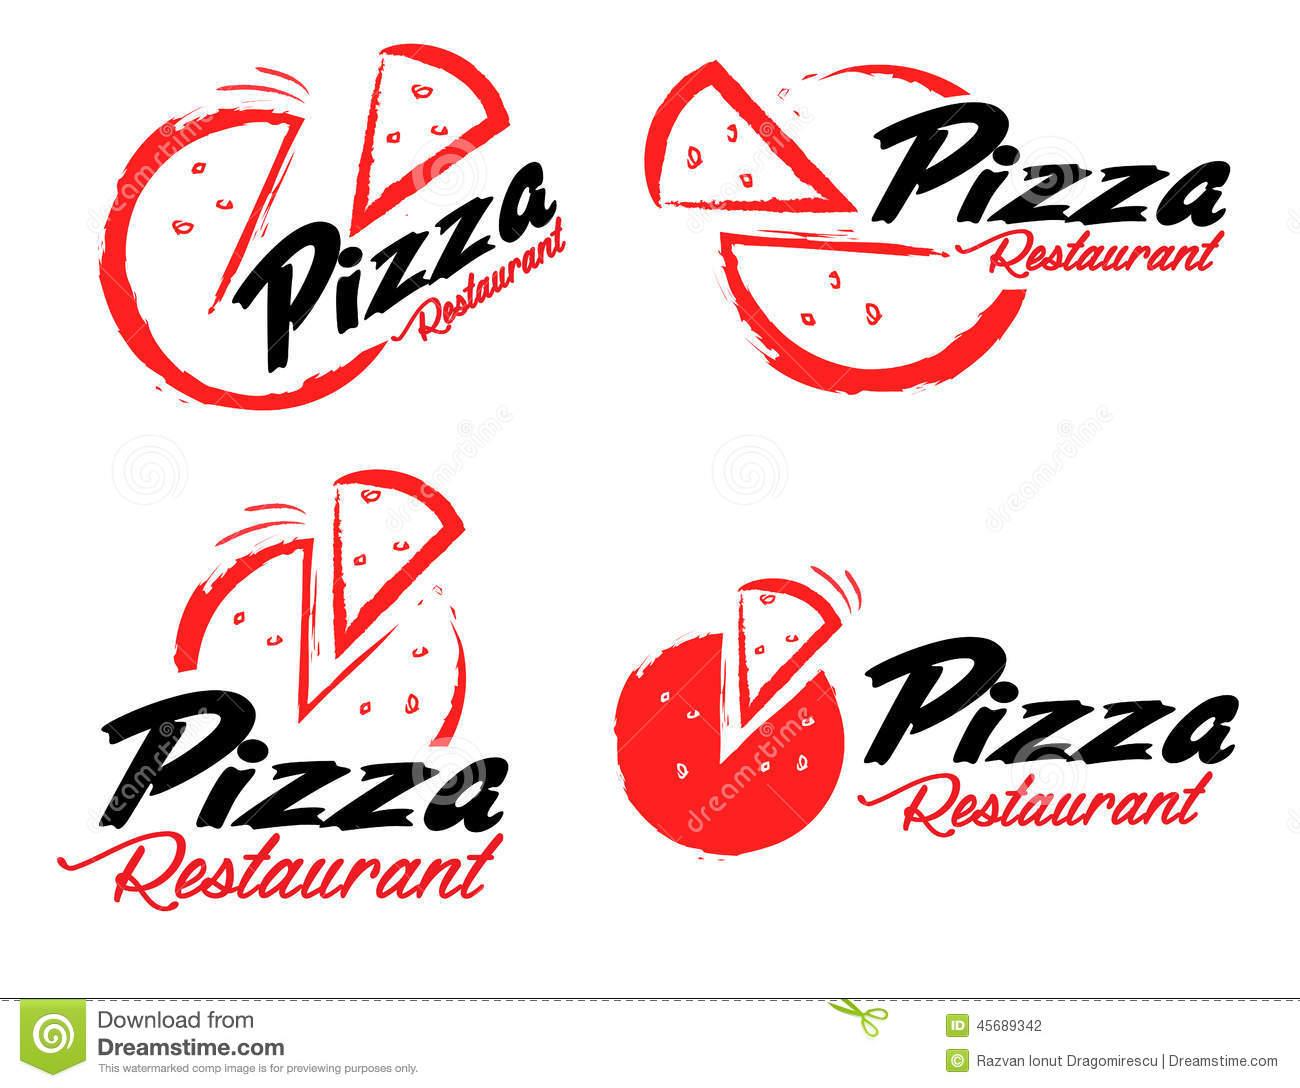 Pizza logo clipart stock Pizza logo clipart - ClipartFest stock